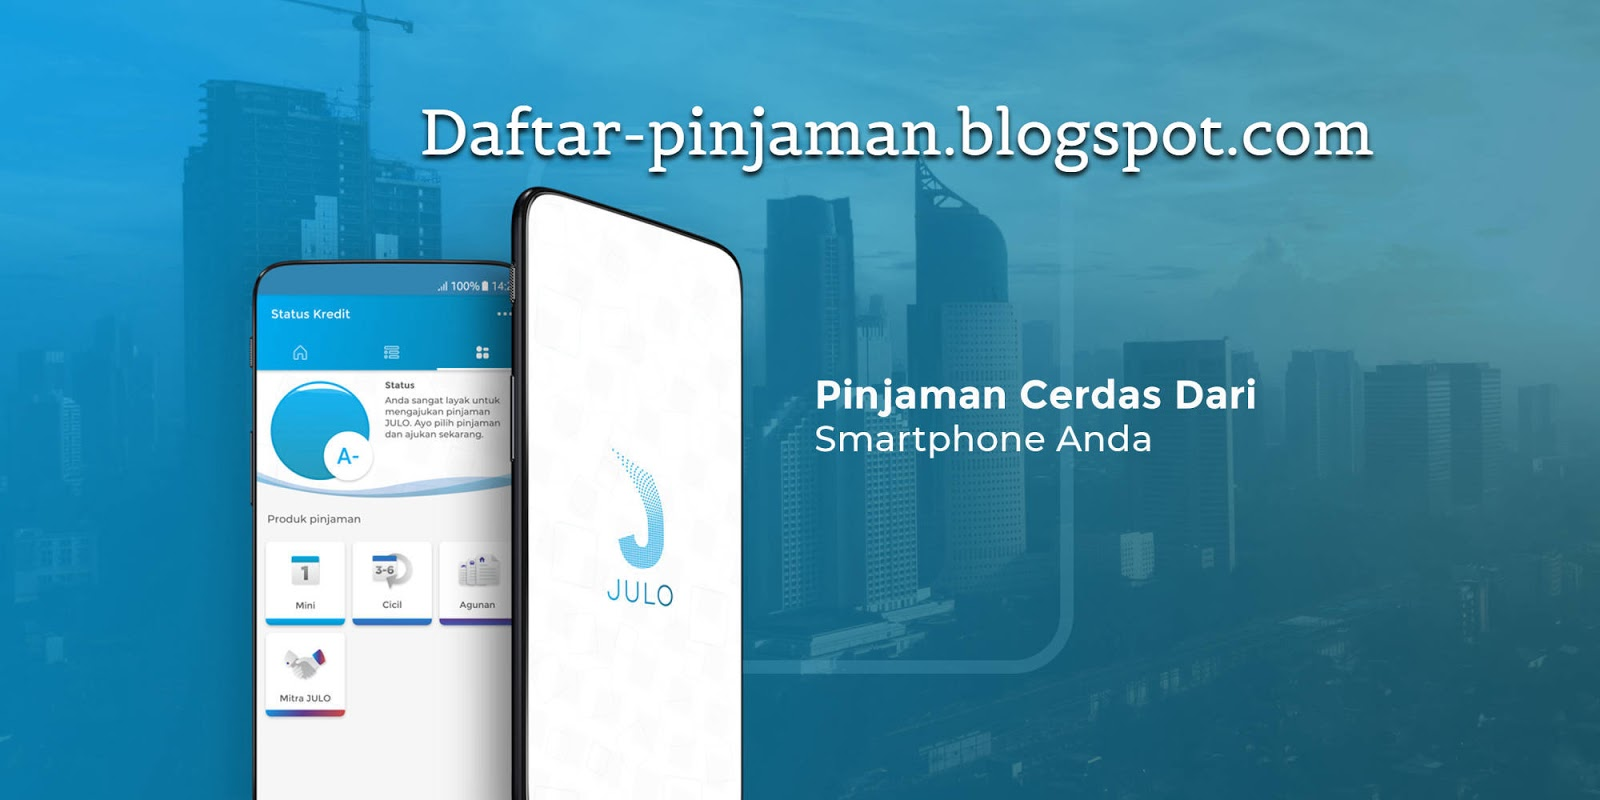 Pinjaman Online Julo Daftar Pinjaman